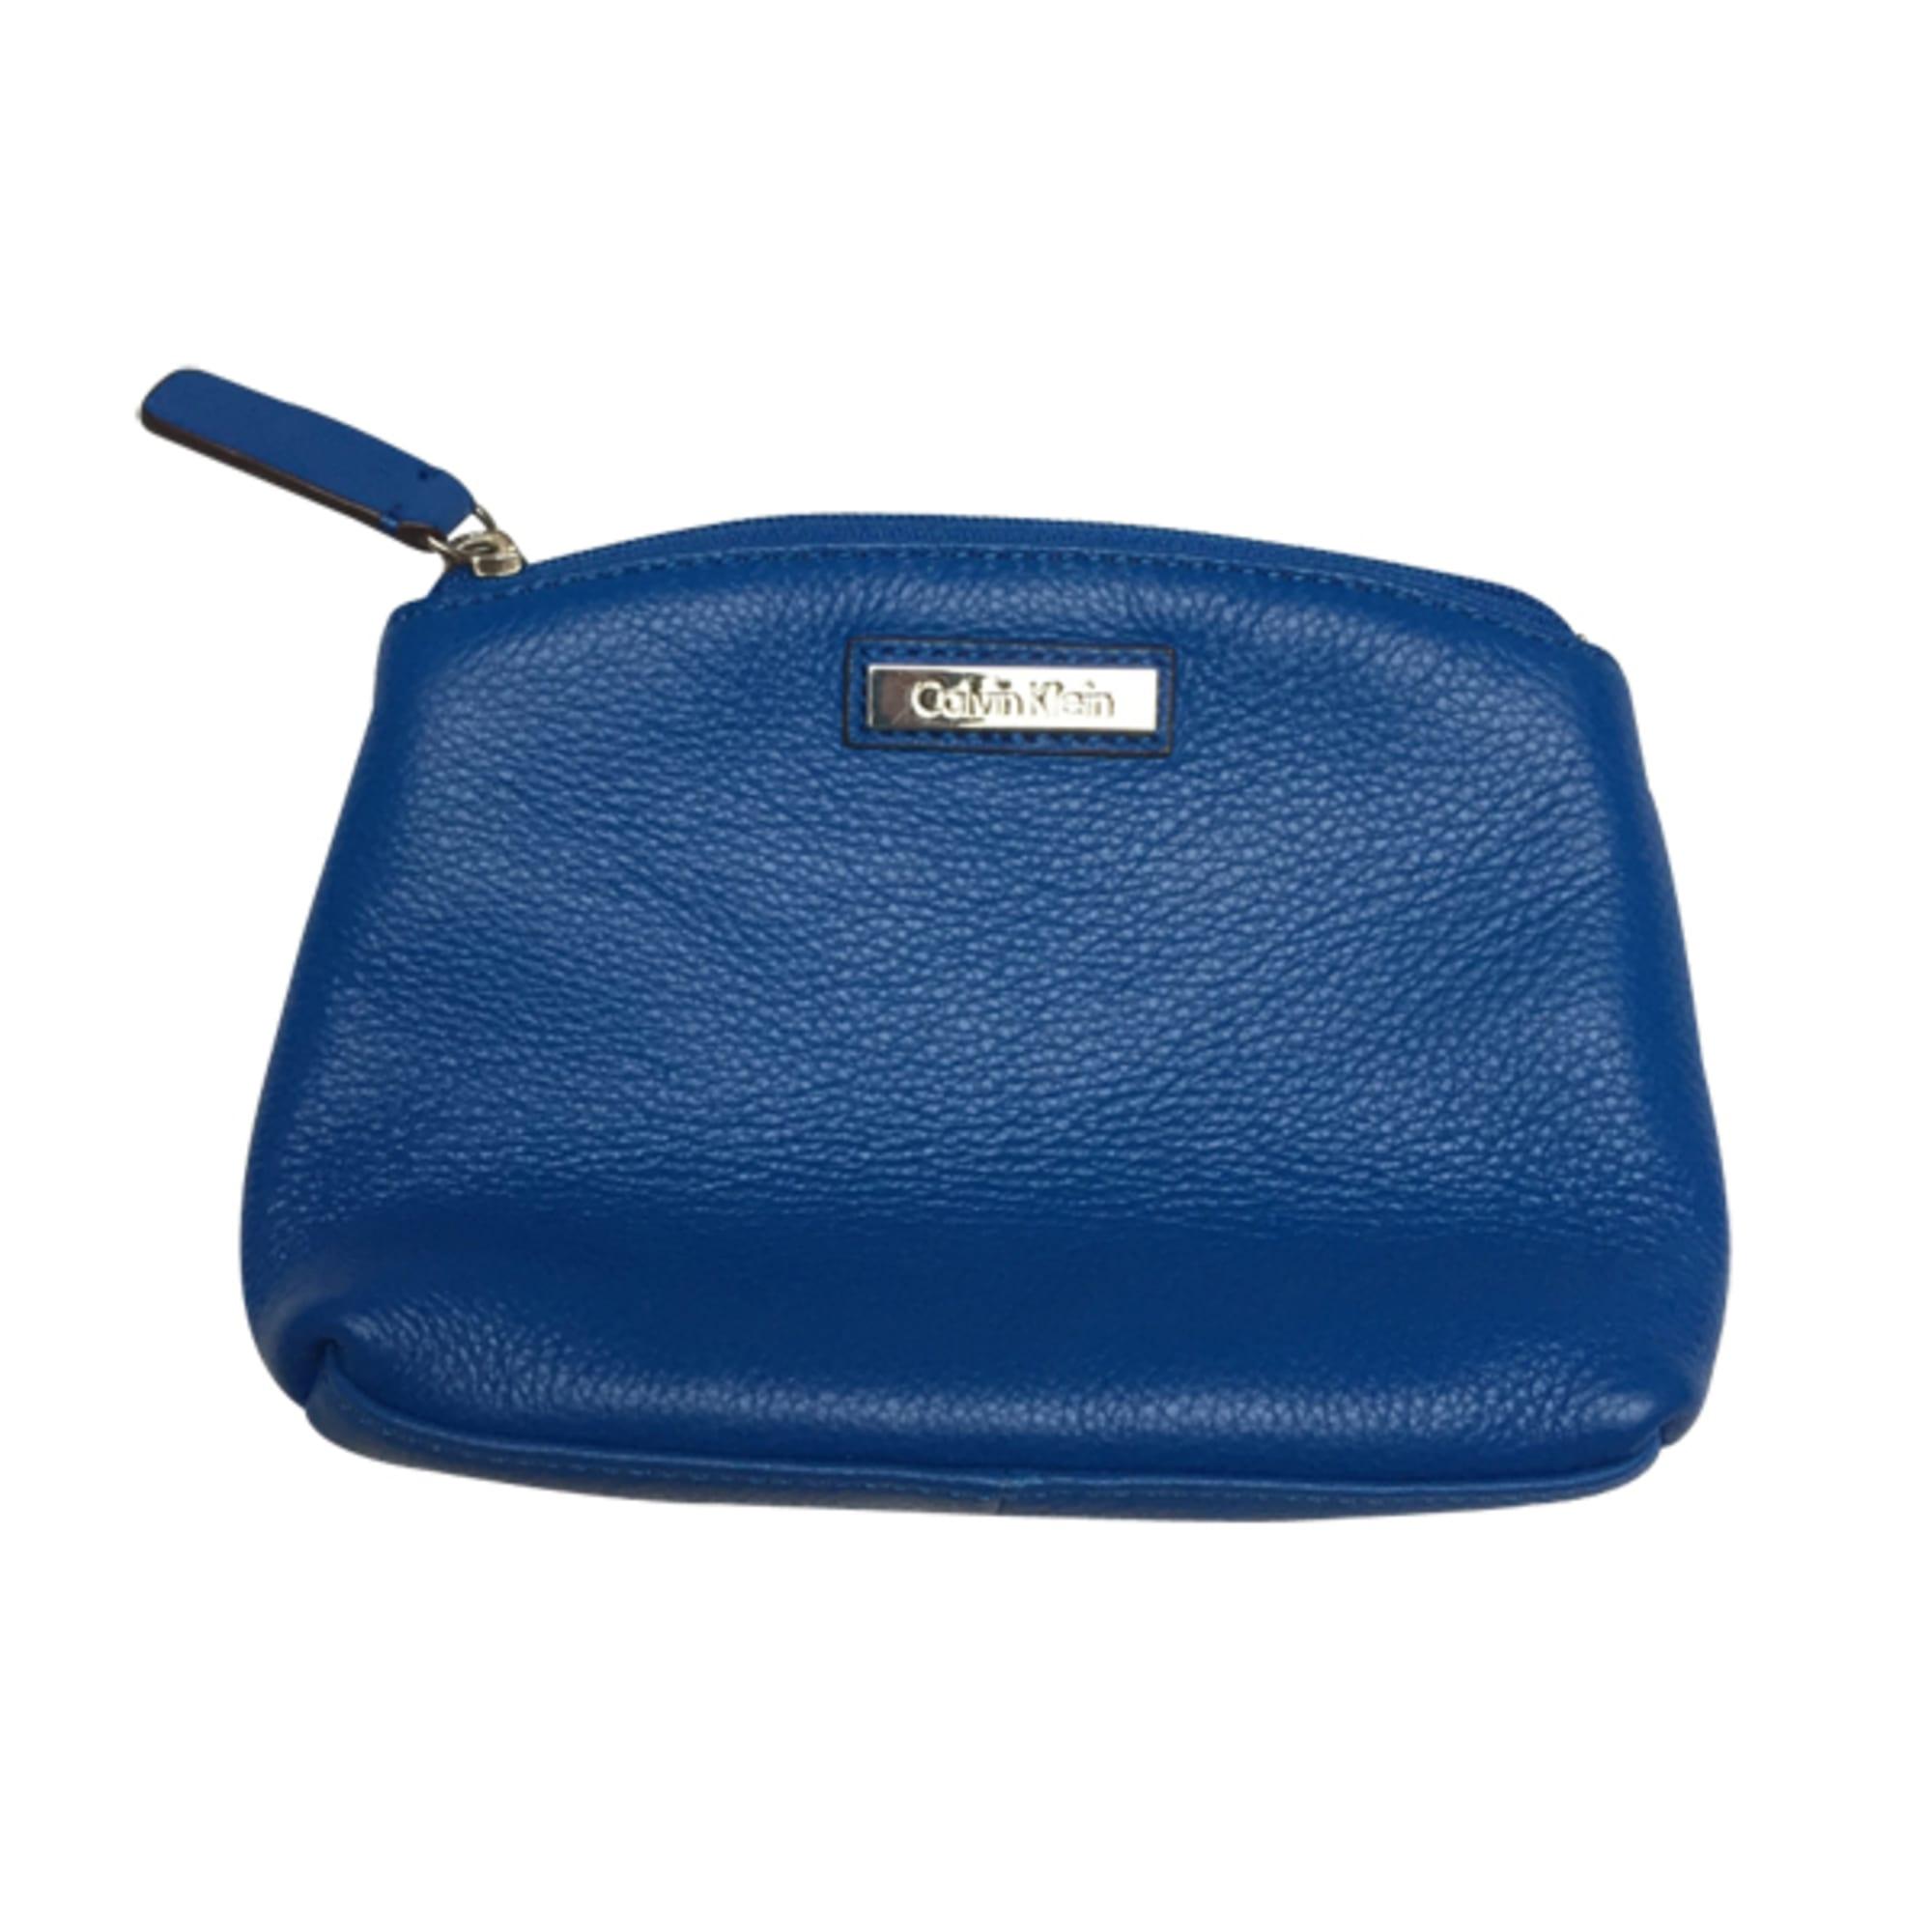 Calvin Sac Pochette De Cuir En Bleu Par Klein Dépôt Bilan Vendu 6OPq6rat